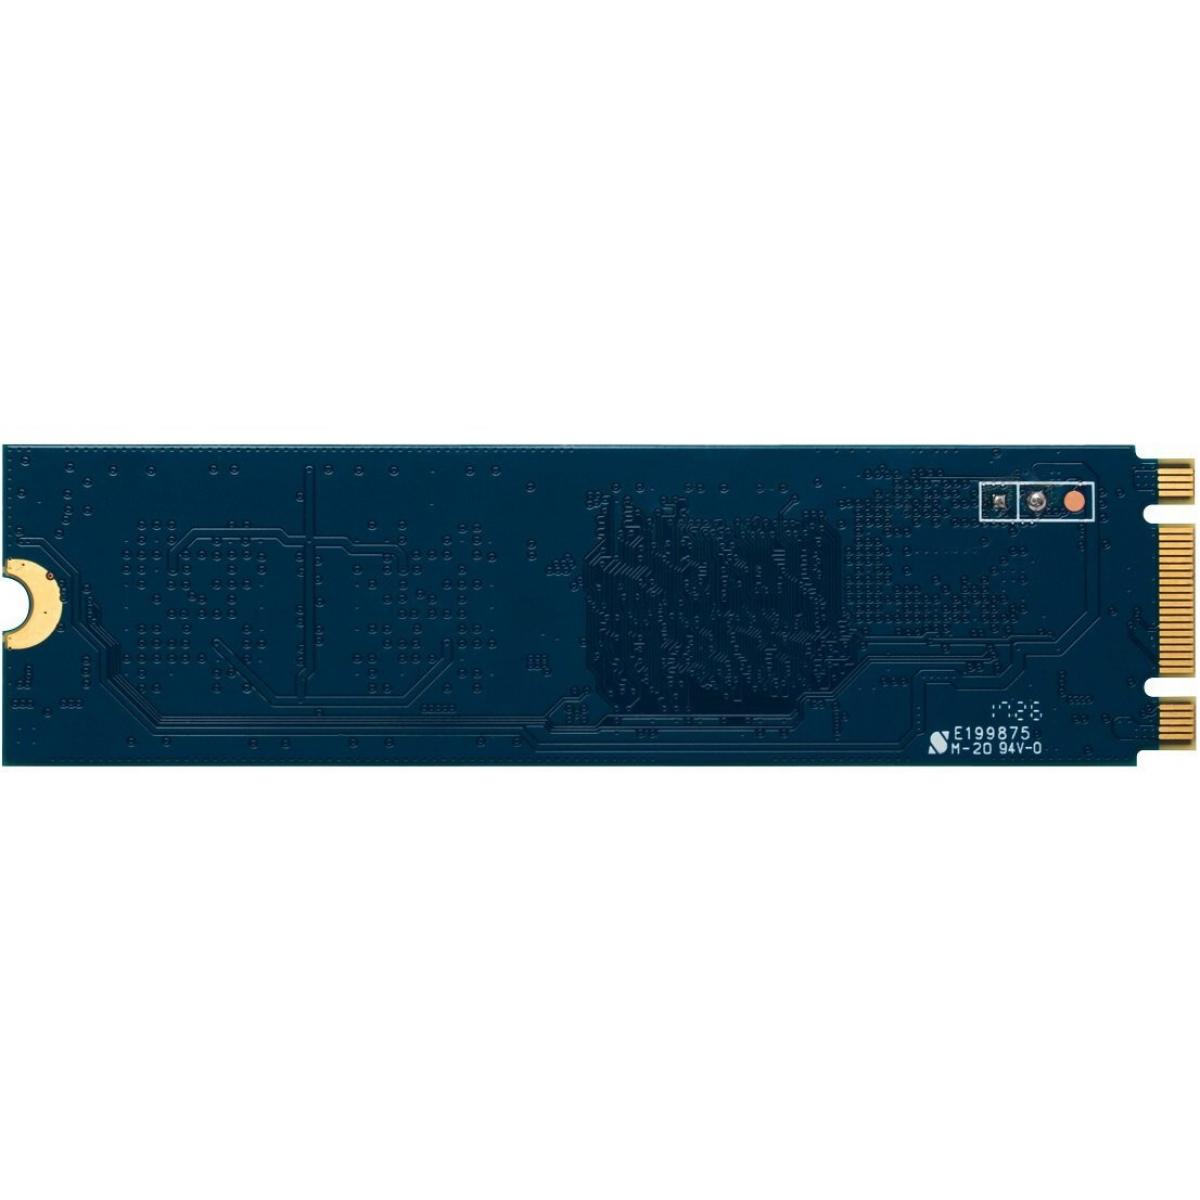 SSD Kingston UV500, 480GB, M.2 2280, Sata, Leitura 520MBs e Gravação 500MBs, SUV500M8-480G